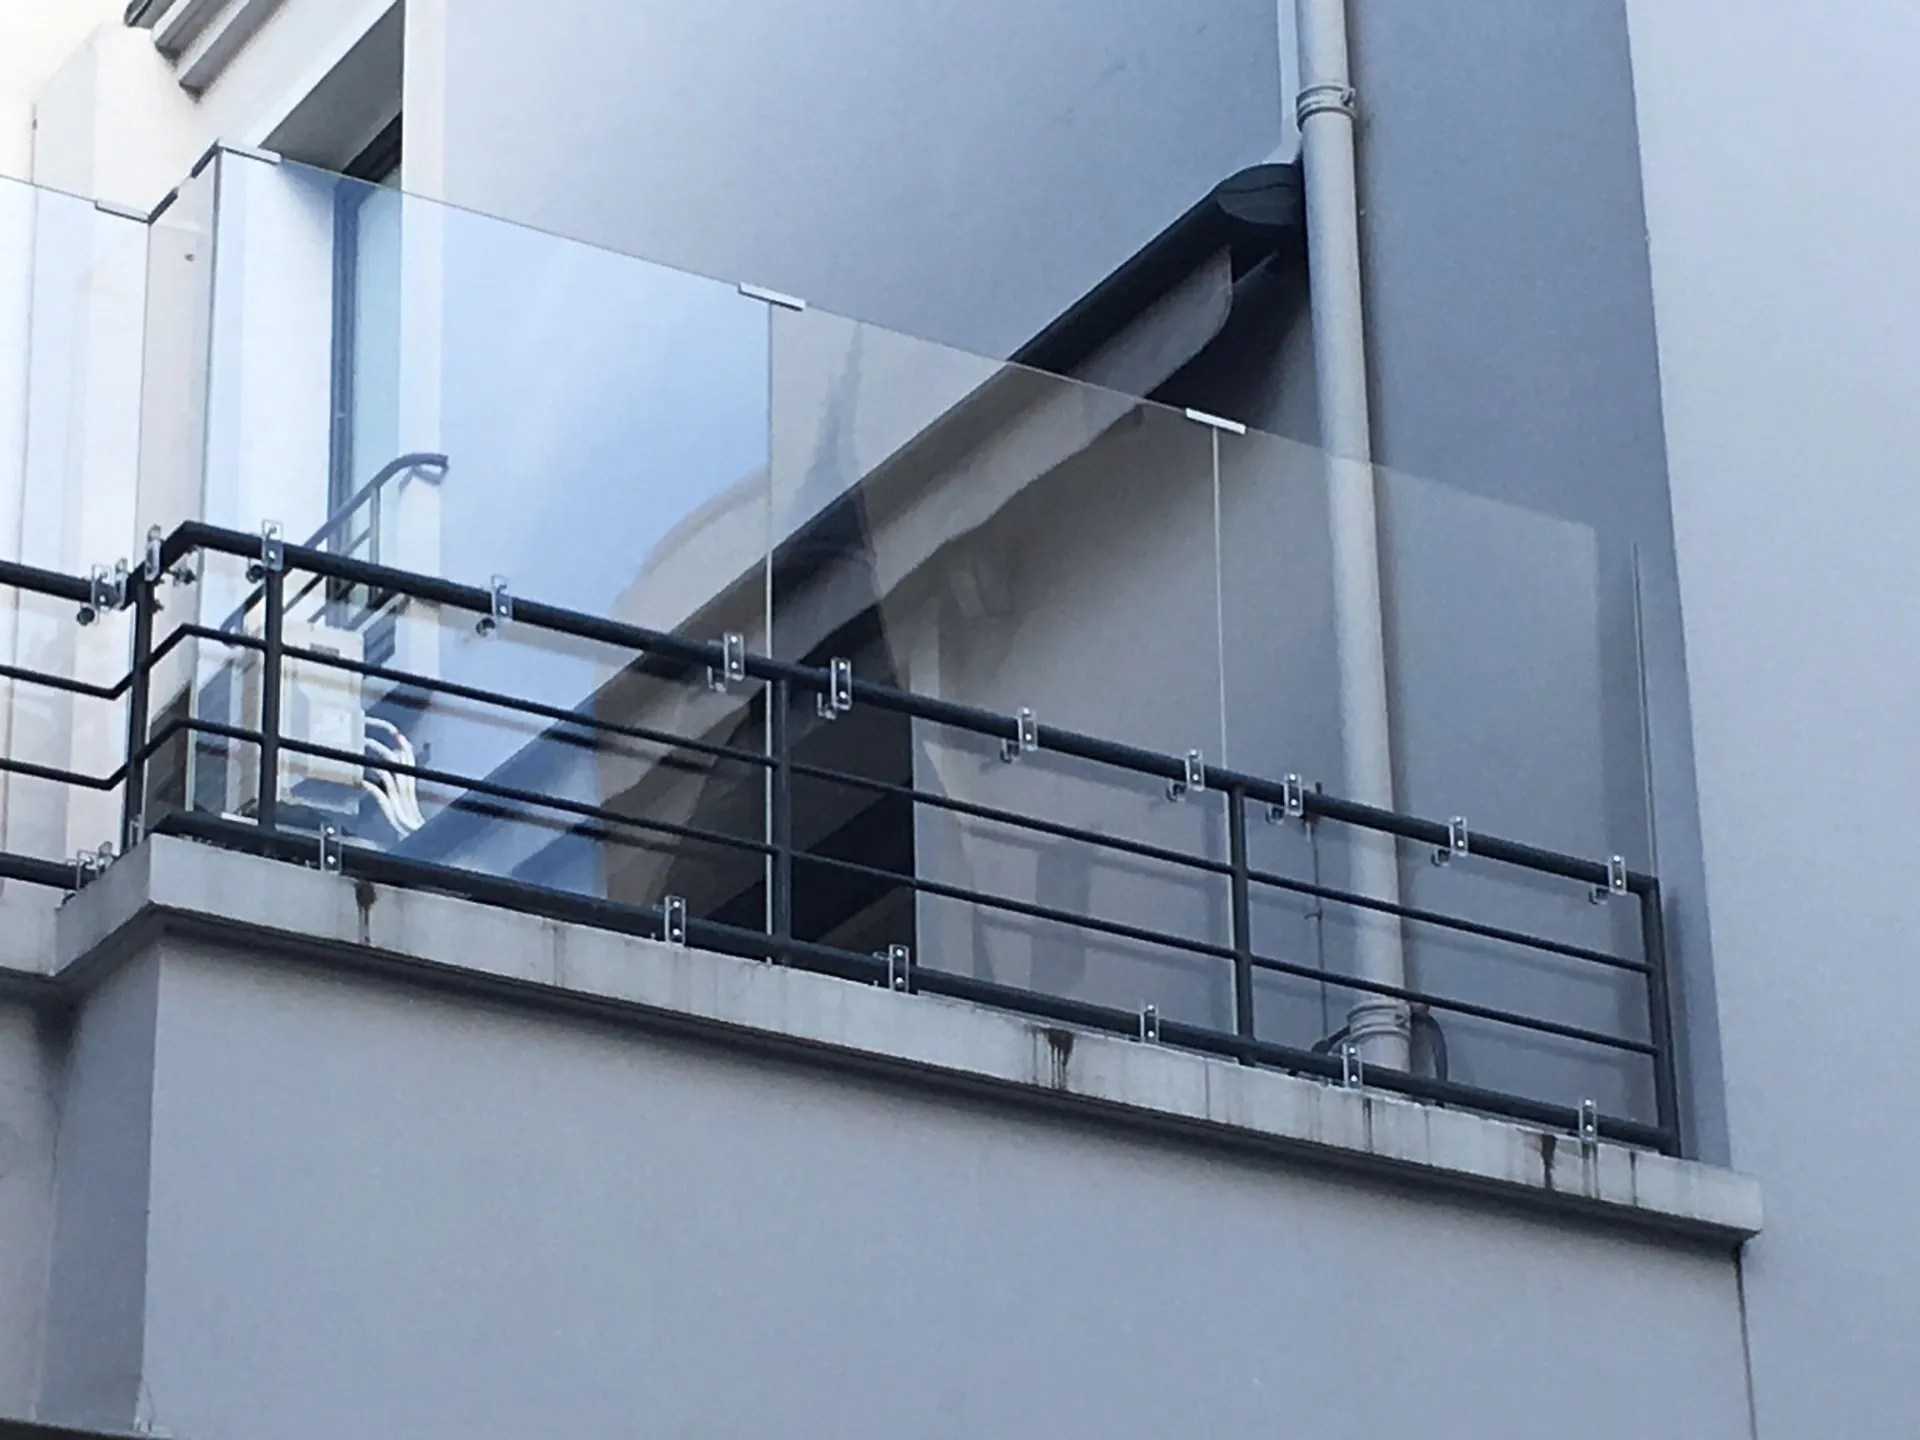 Securite Terrasse Panneau Plexiglas Barriere Contre Vent Brise Vue